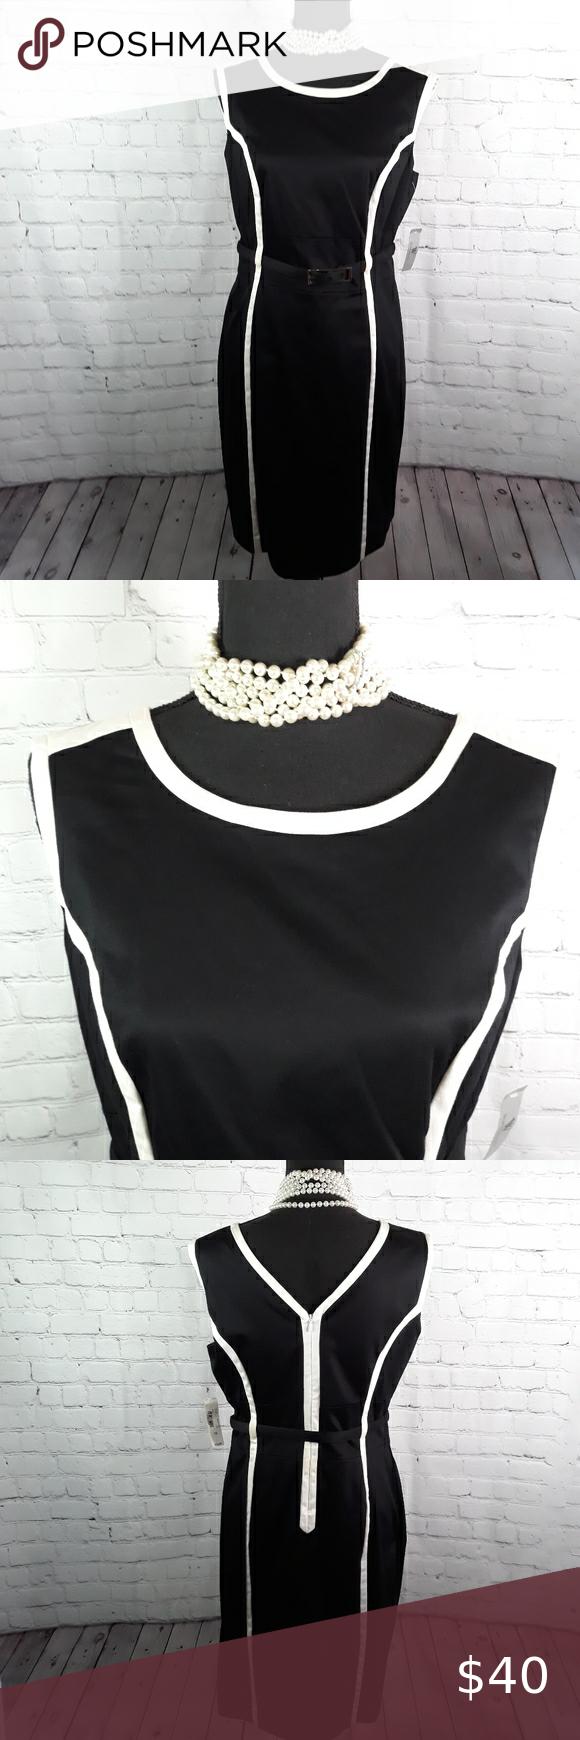 Worthington Black Dress Black Dresses Casual Sleeveless Shift Dress Black Dress [ 1740 x 580 Pixel ]